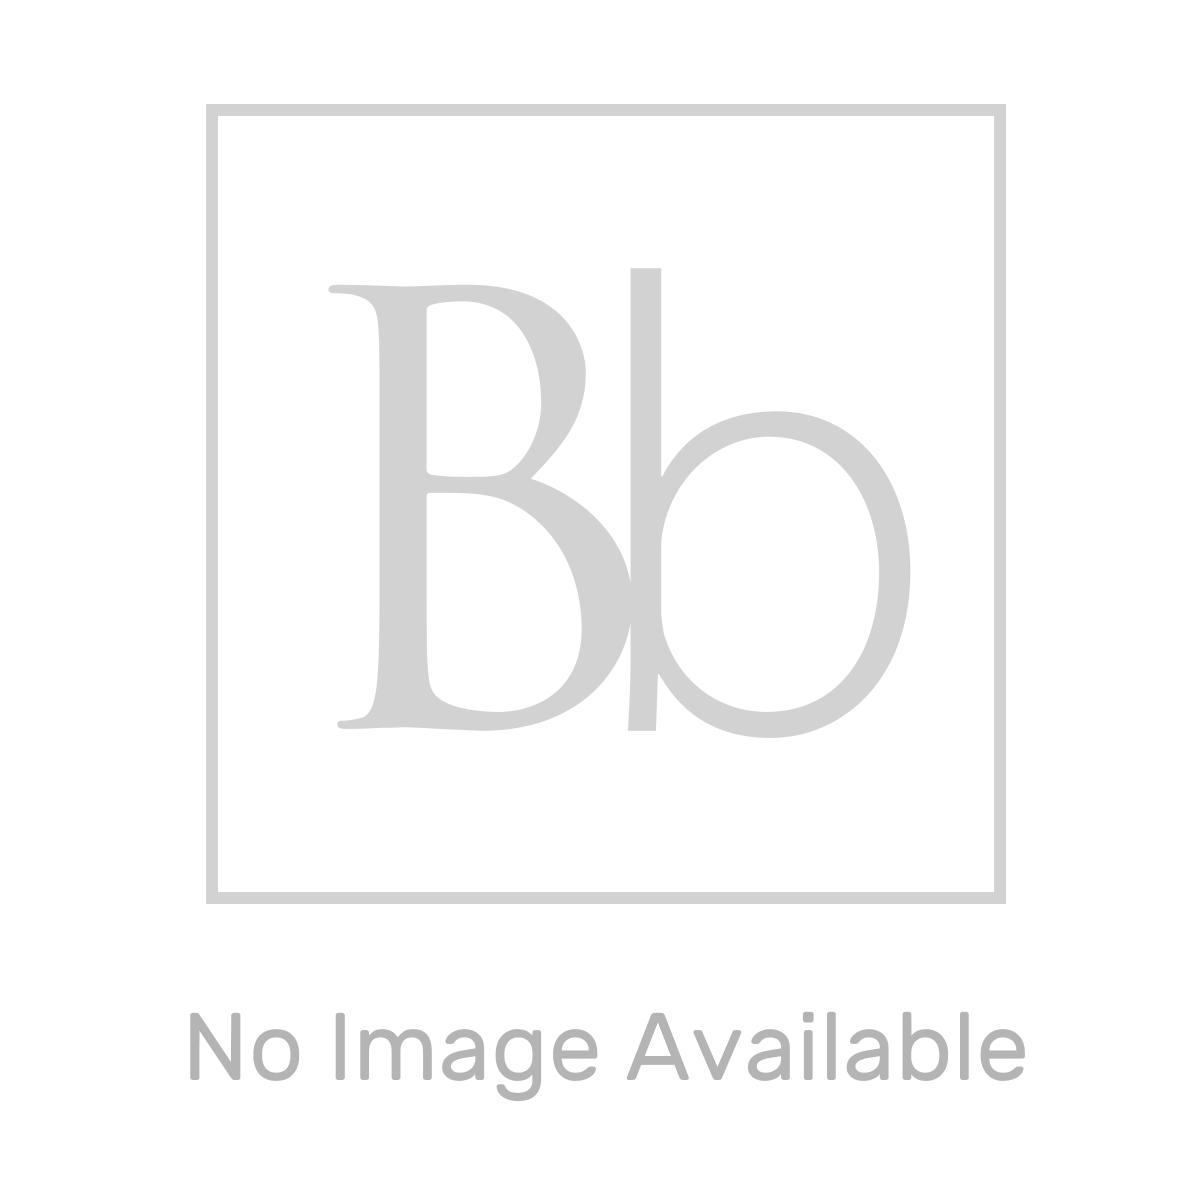 Aquadart Black Slate Shower Tray 1700 x 700 Lifestyle